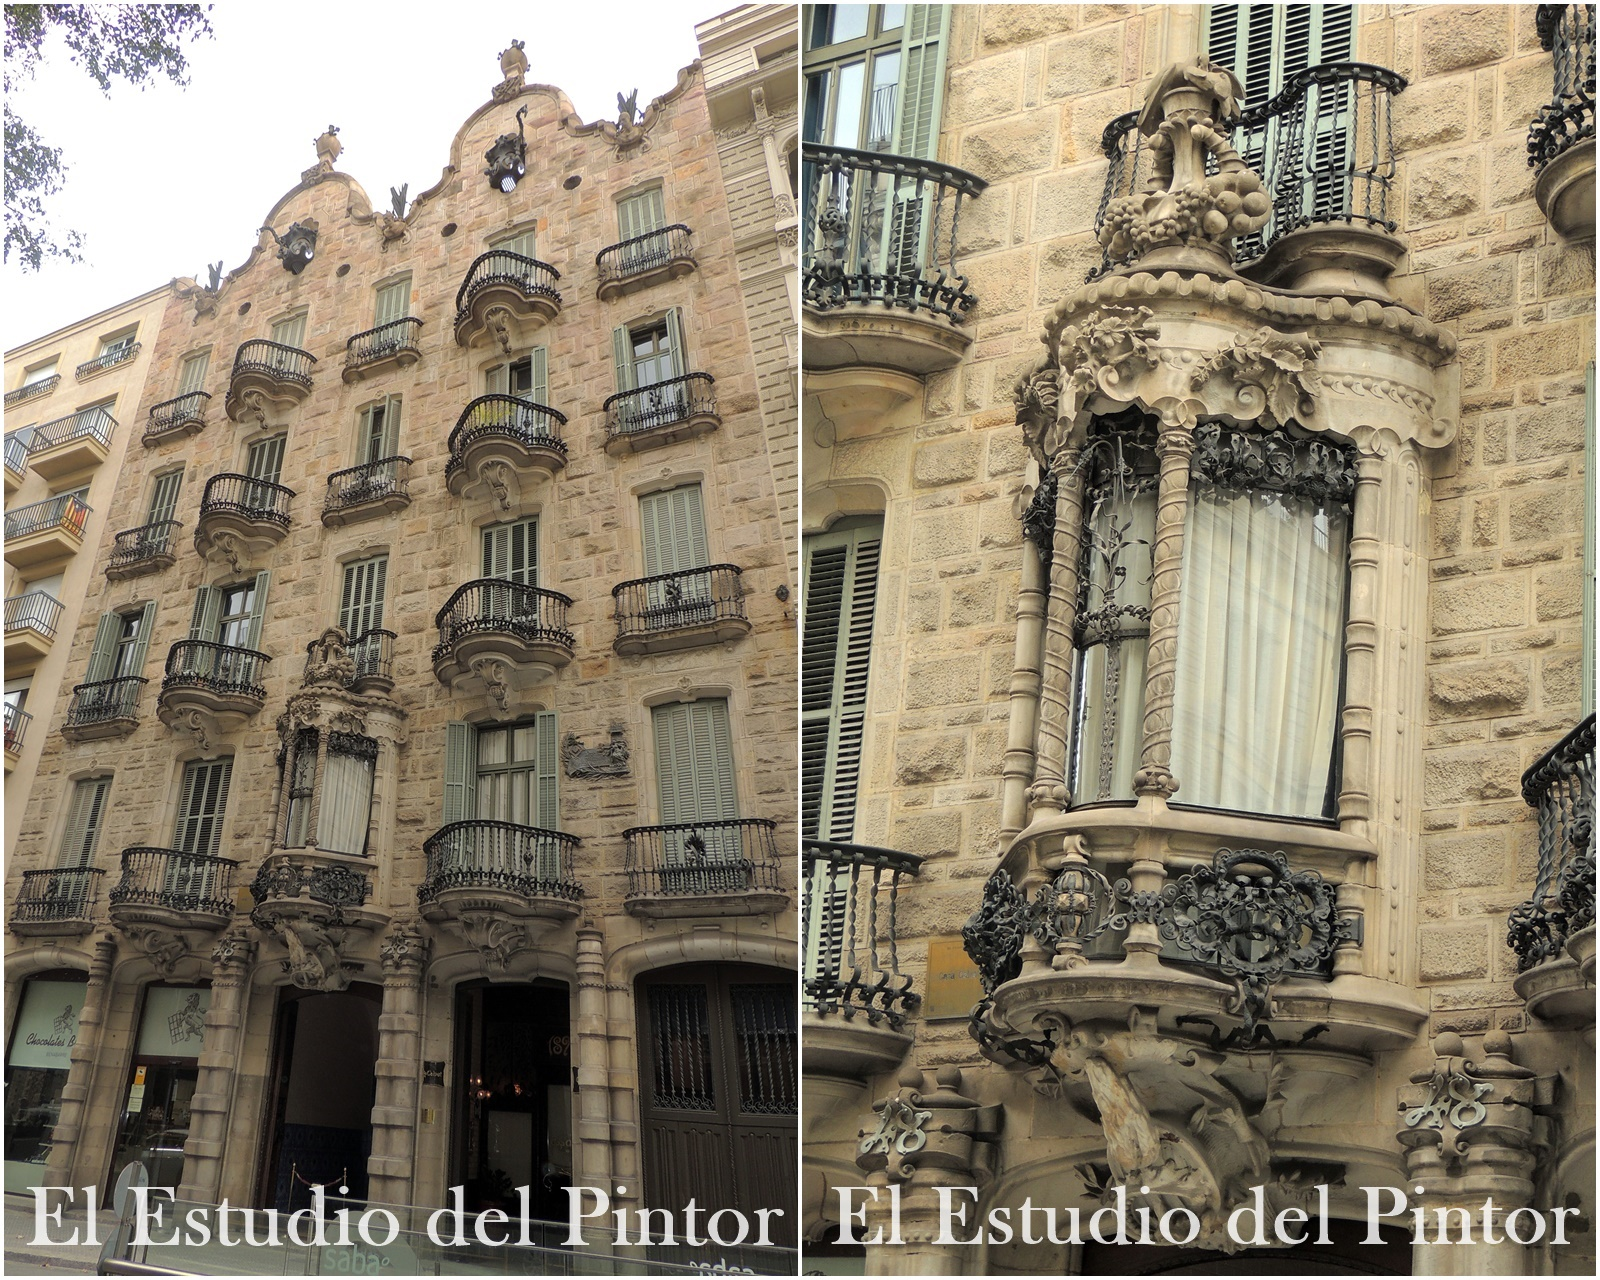 4. Casa Calvet, Gaudí